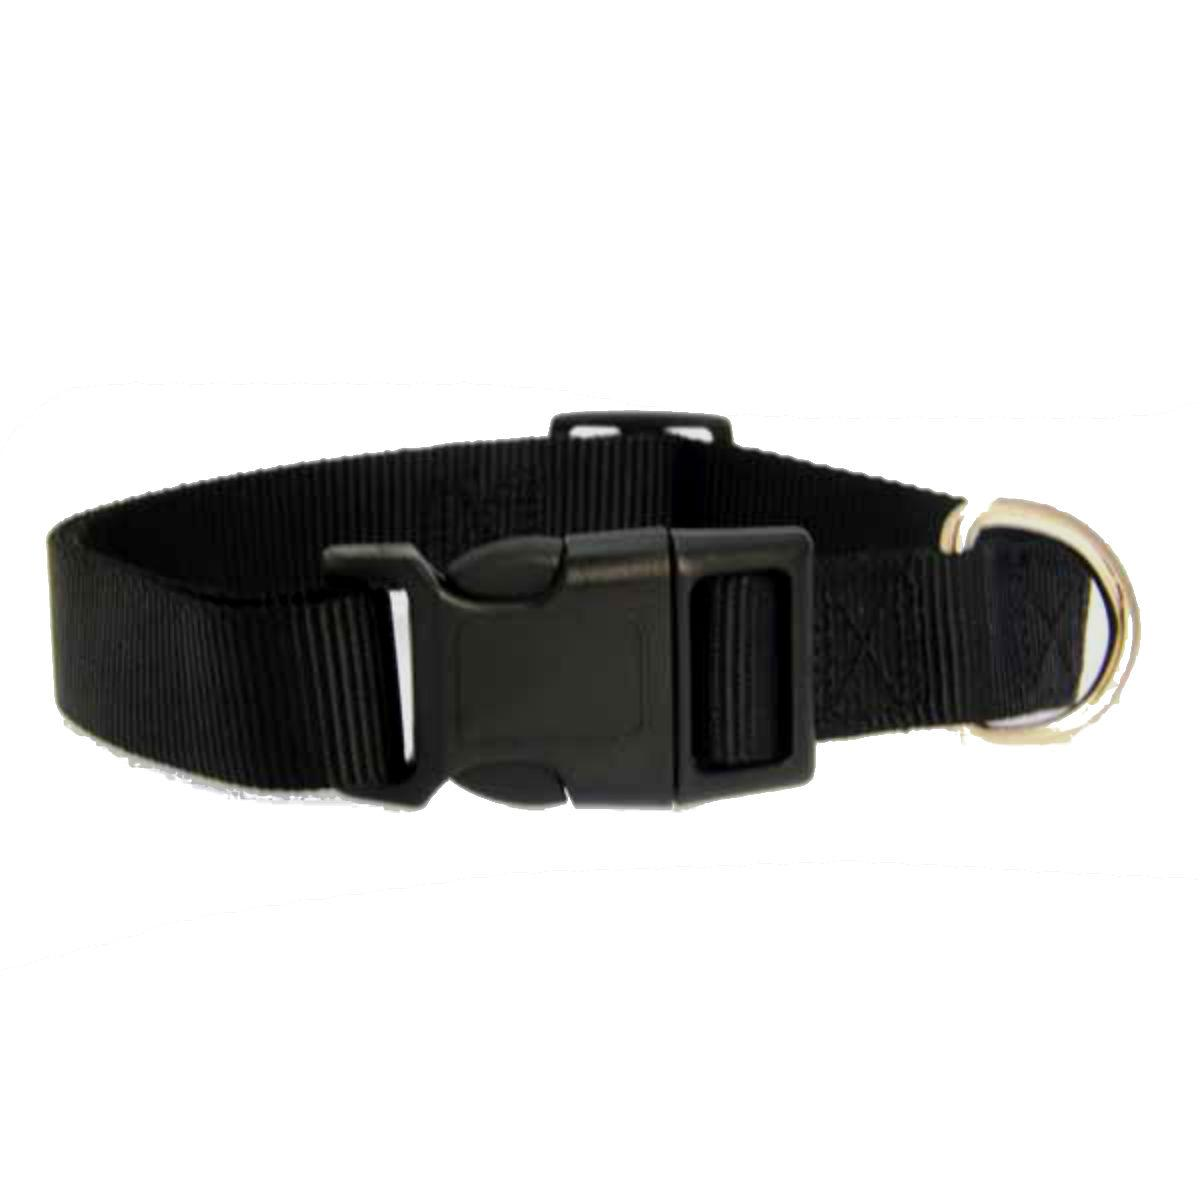 Casual Canine Nylon Dog Collar - Jet Black